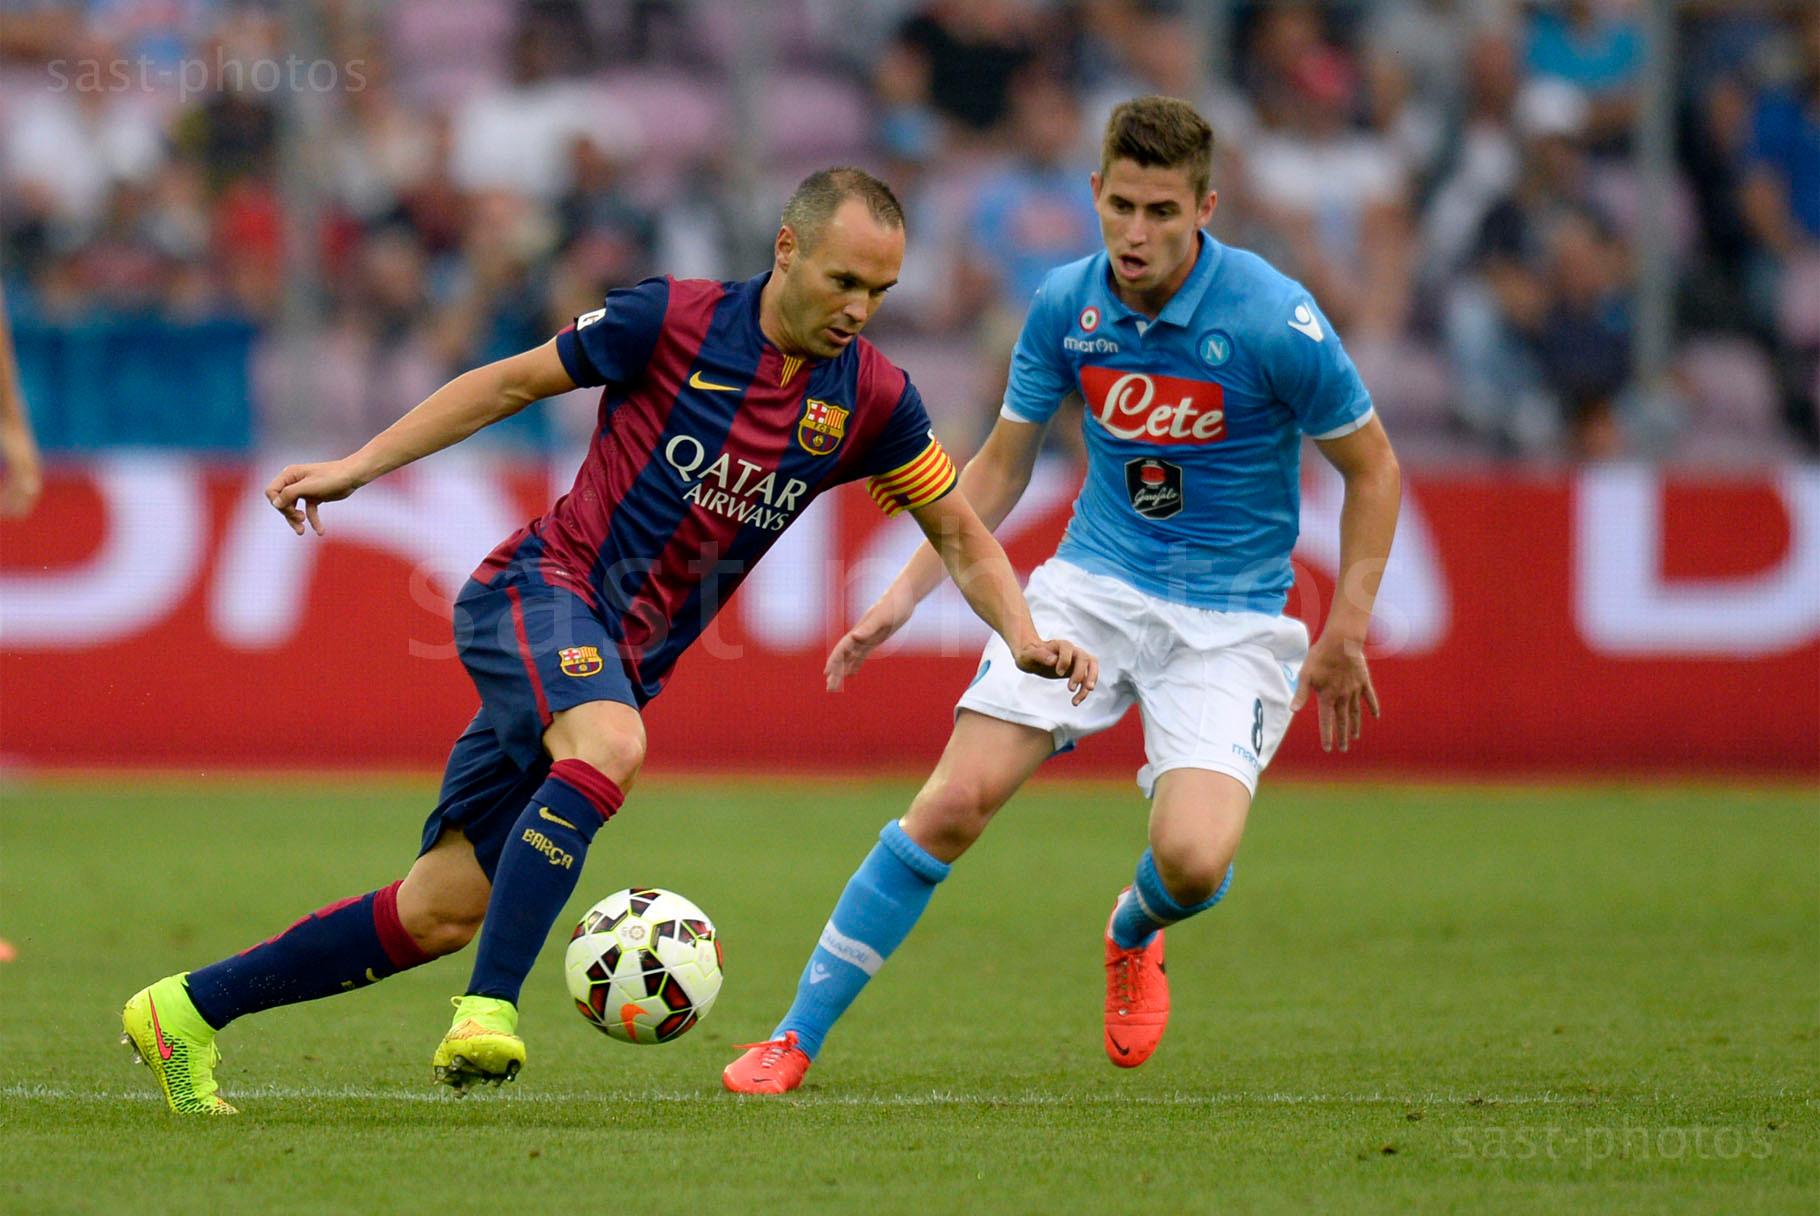 Andres Iniesta Lujan (L. Barcelona) gegen Jorge Luiz Frello Jorginho (Napoli)